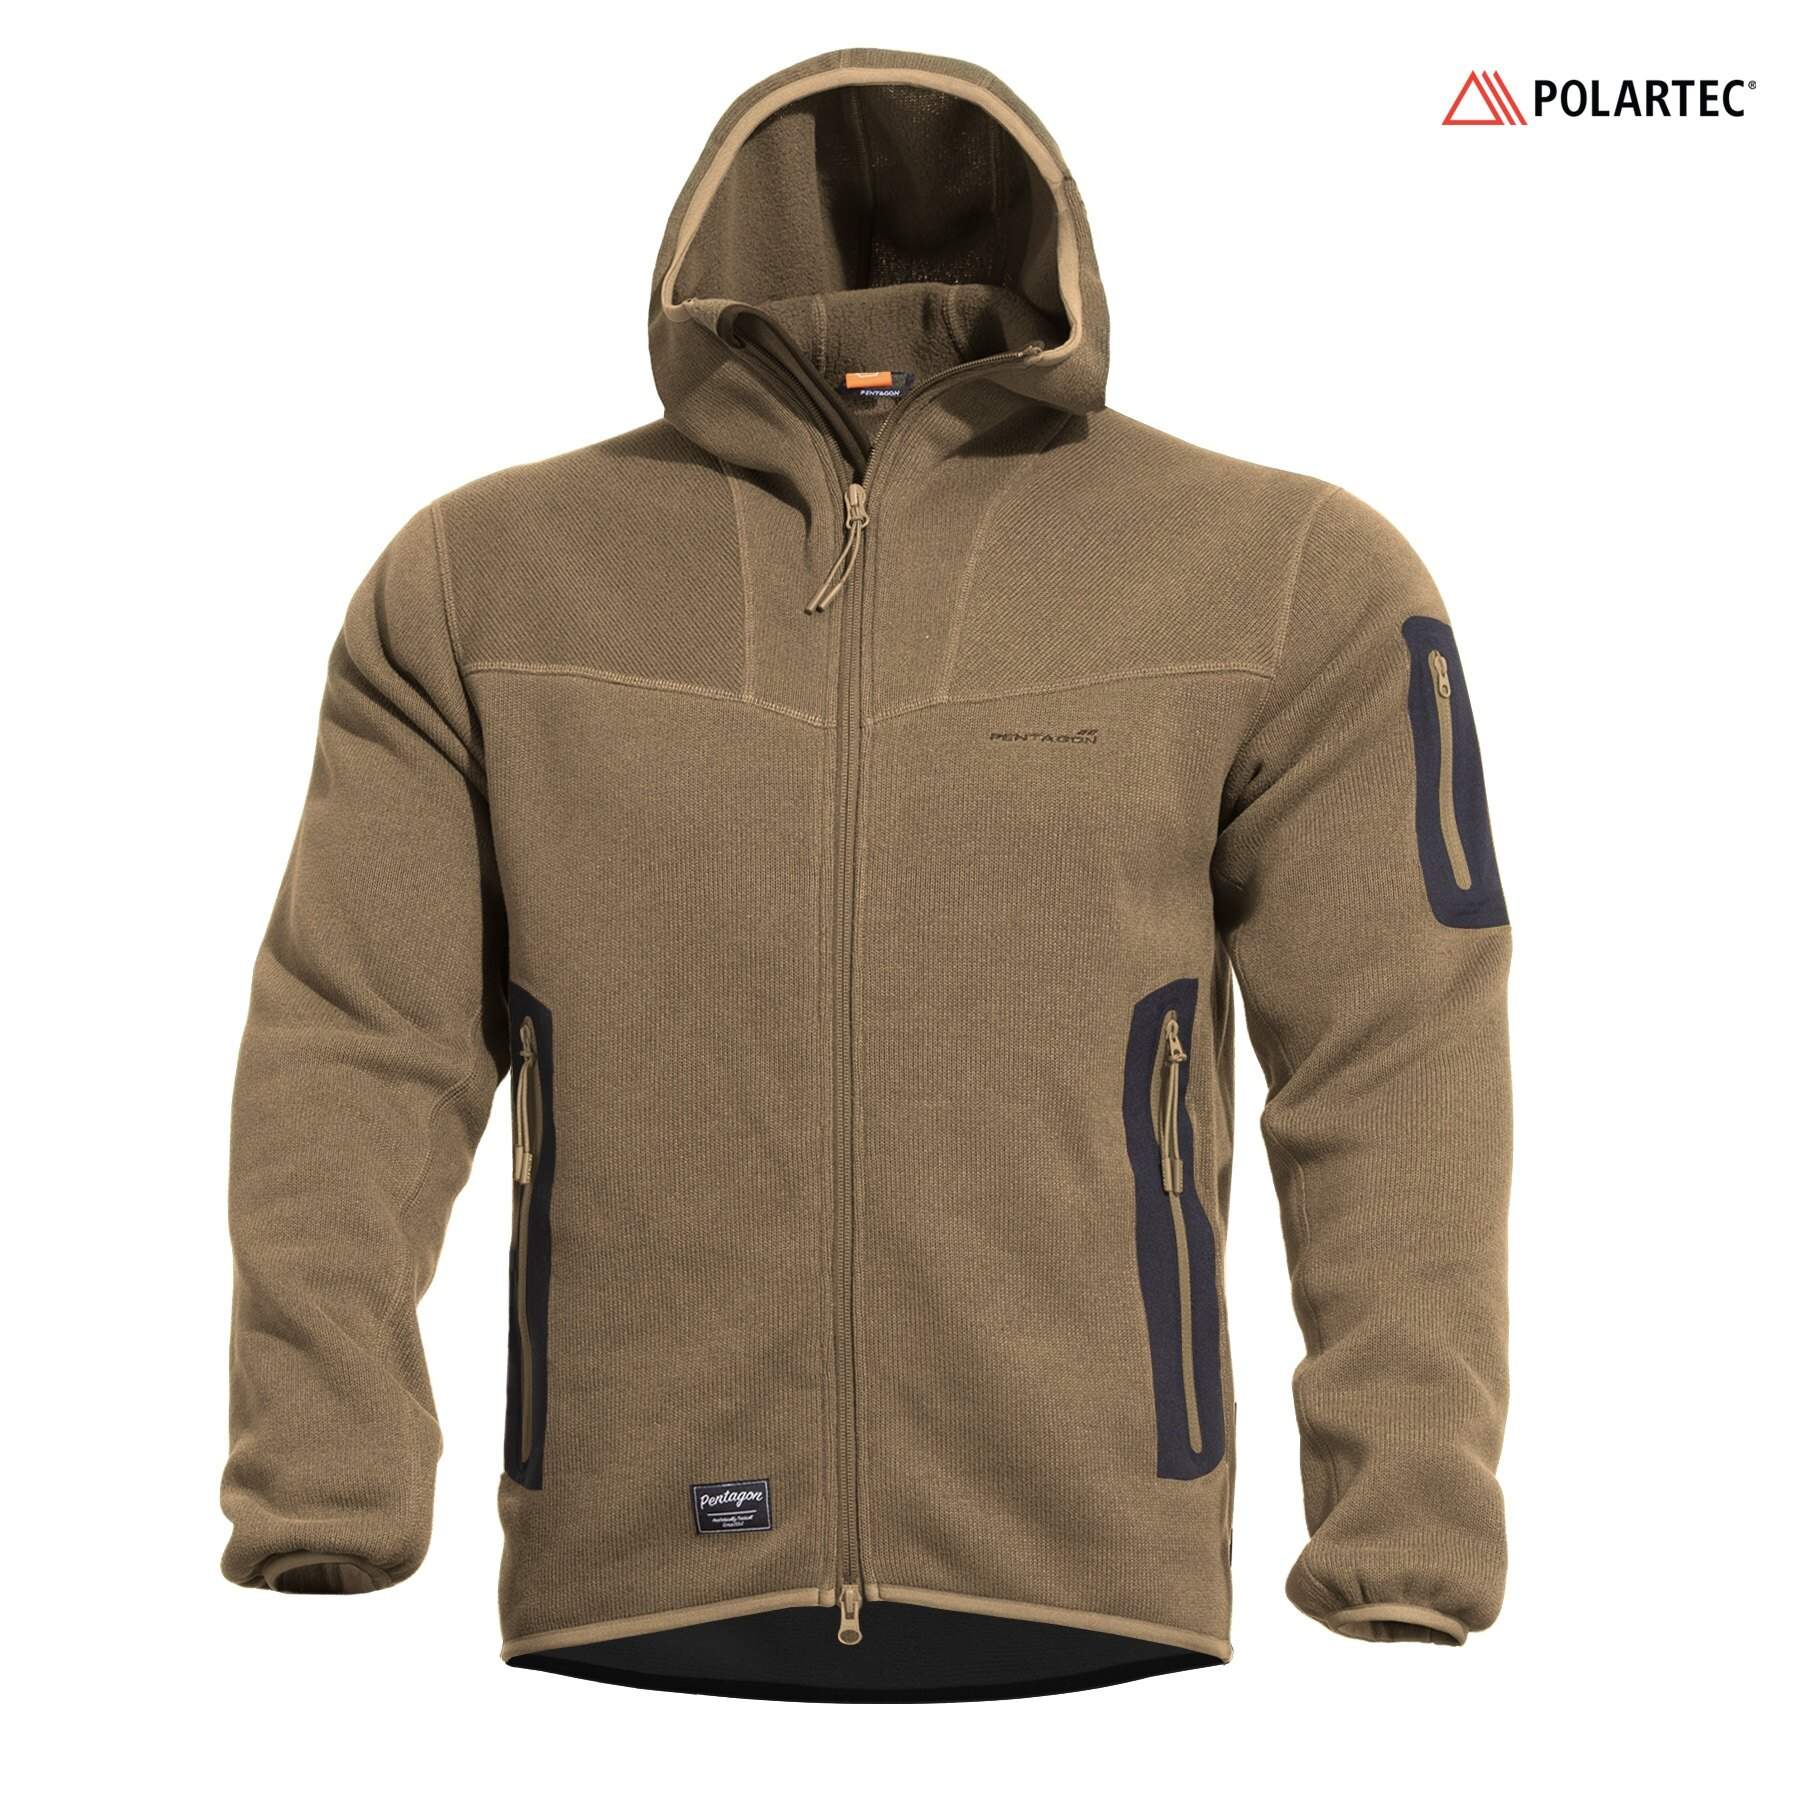 Mikina Falcon Pro Sweater Polartec® Pentagon® – Coyote (Farba: Coyote, Veľkosť: XXL)